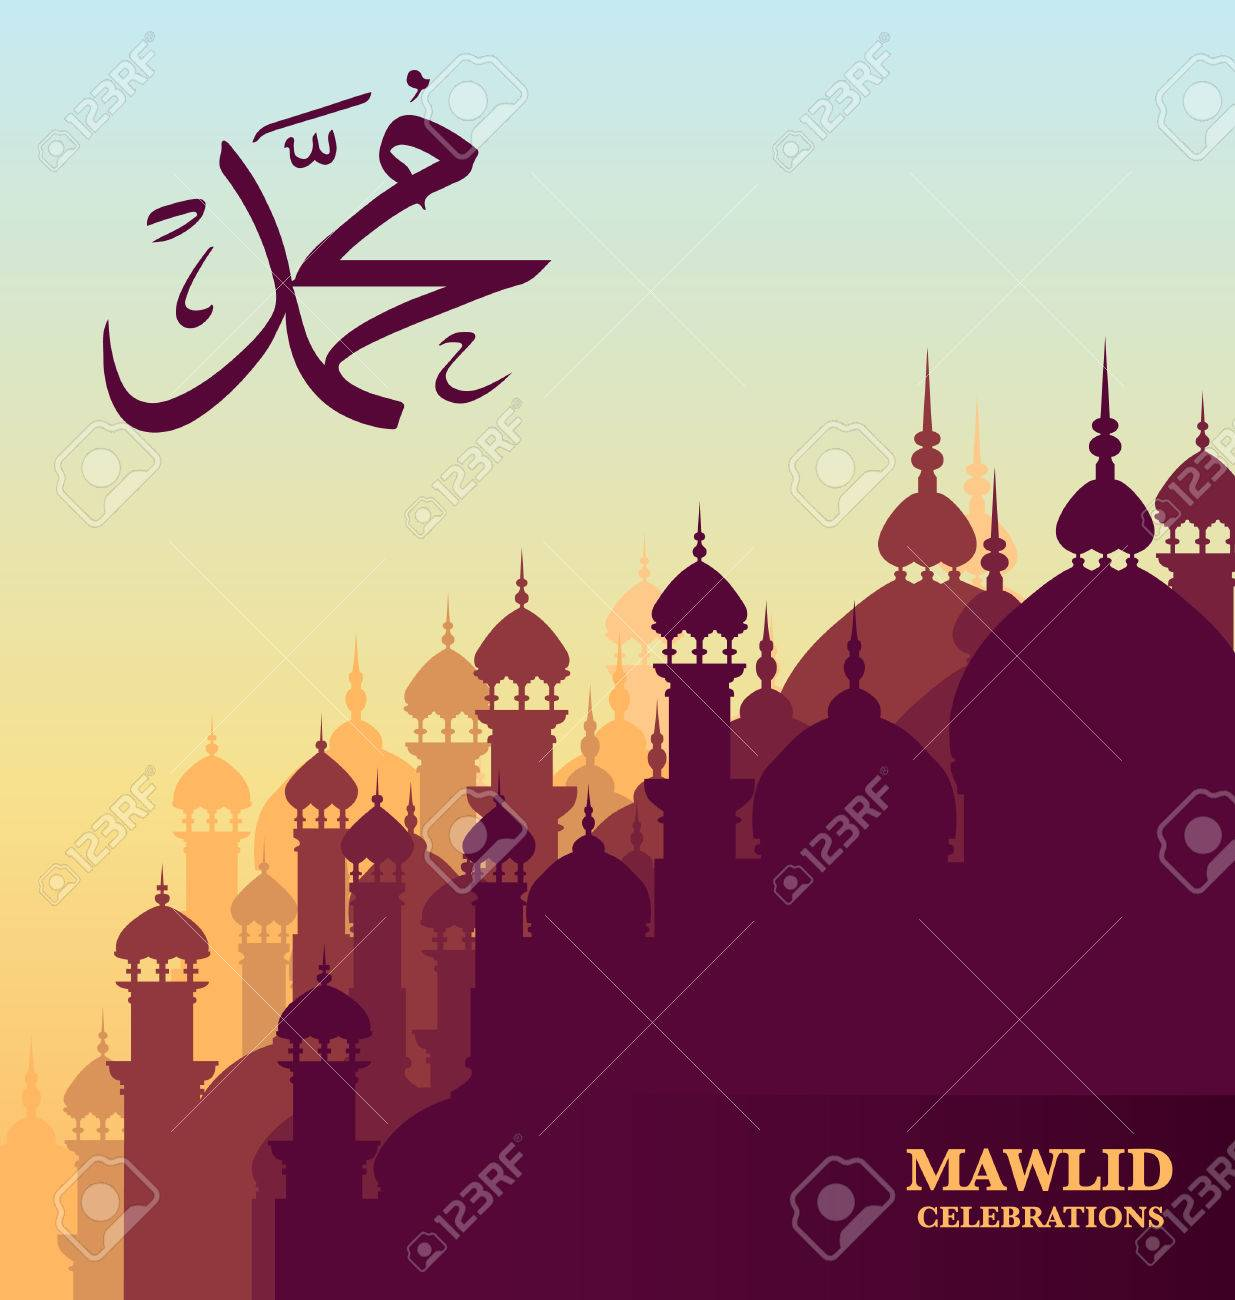 Birthday of the prophet Muhammad Design - Mawlid Celebrations - 64270782